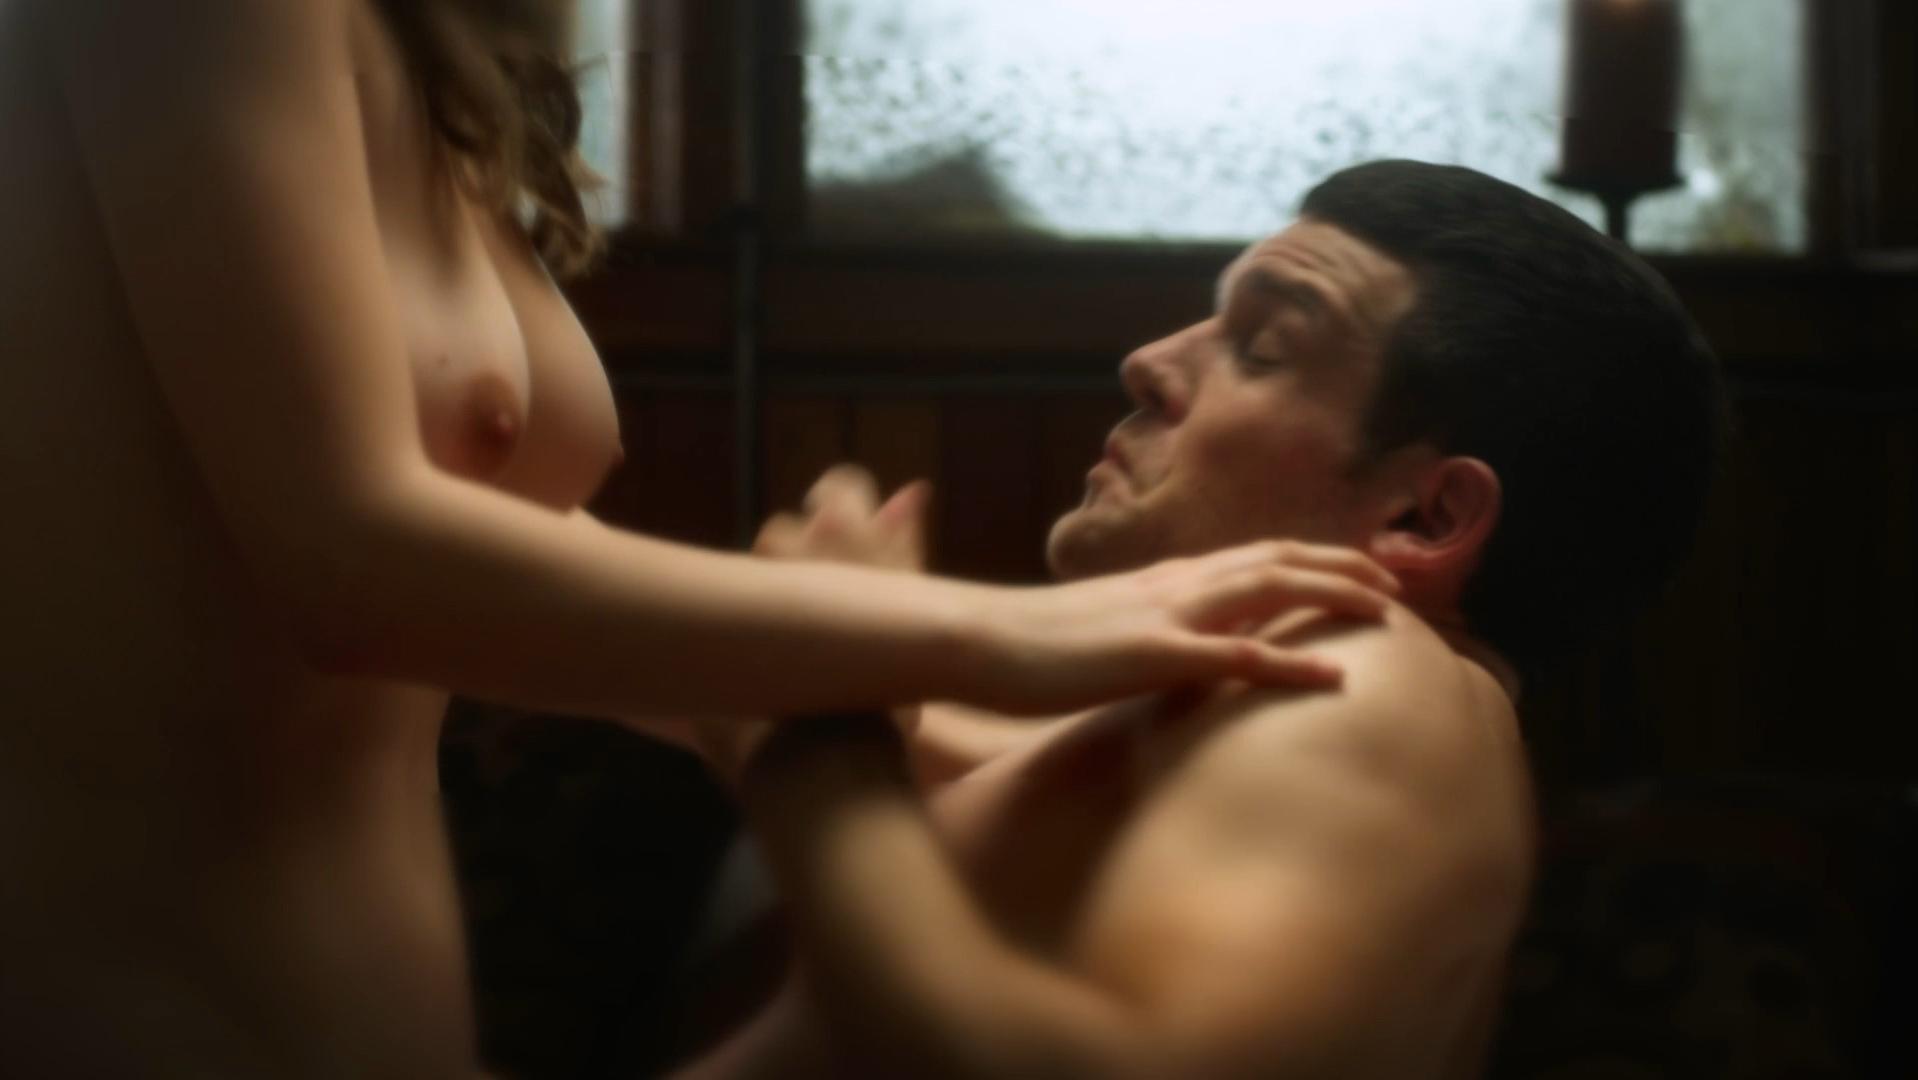 Olivia andrup nude scene